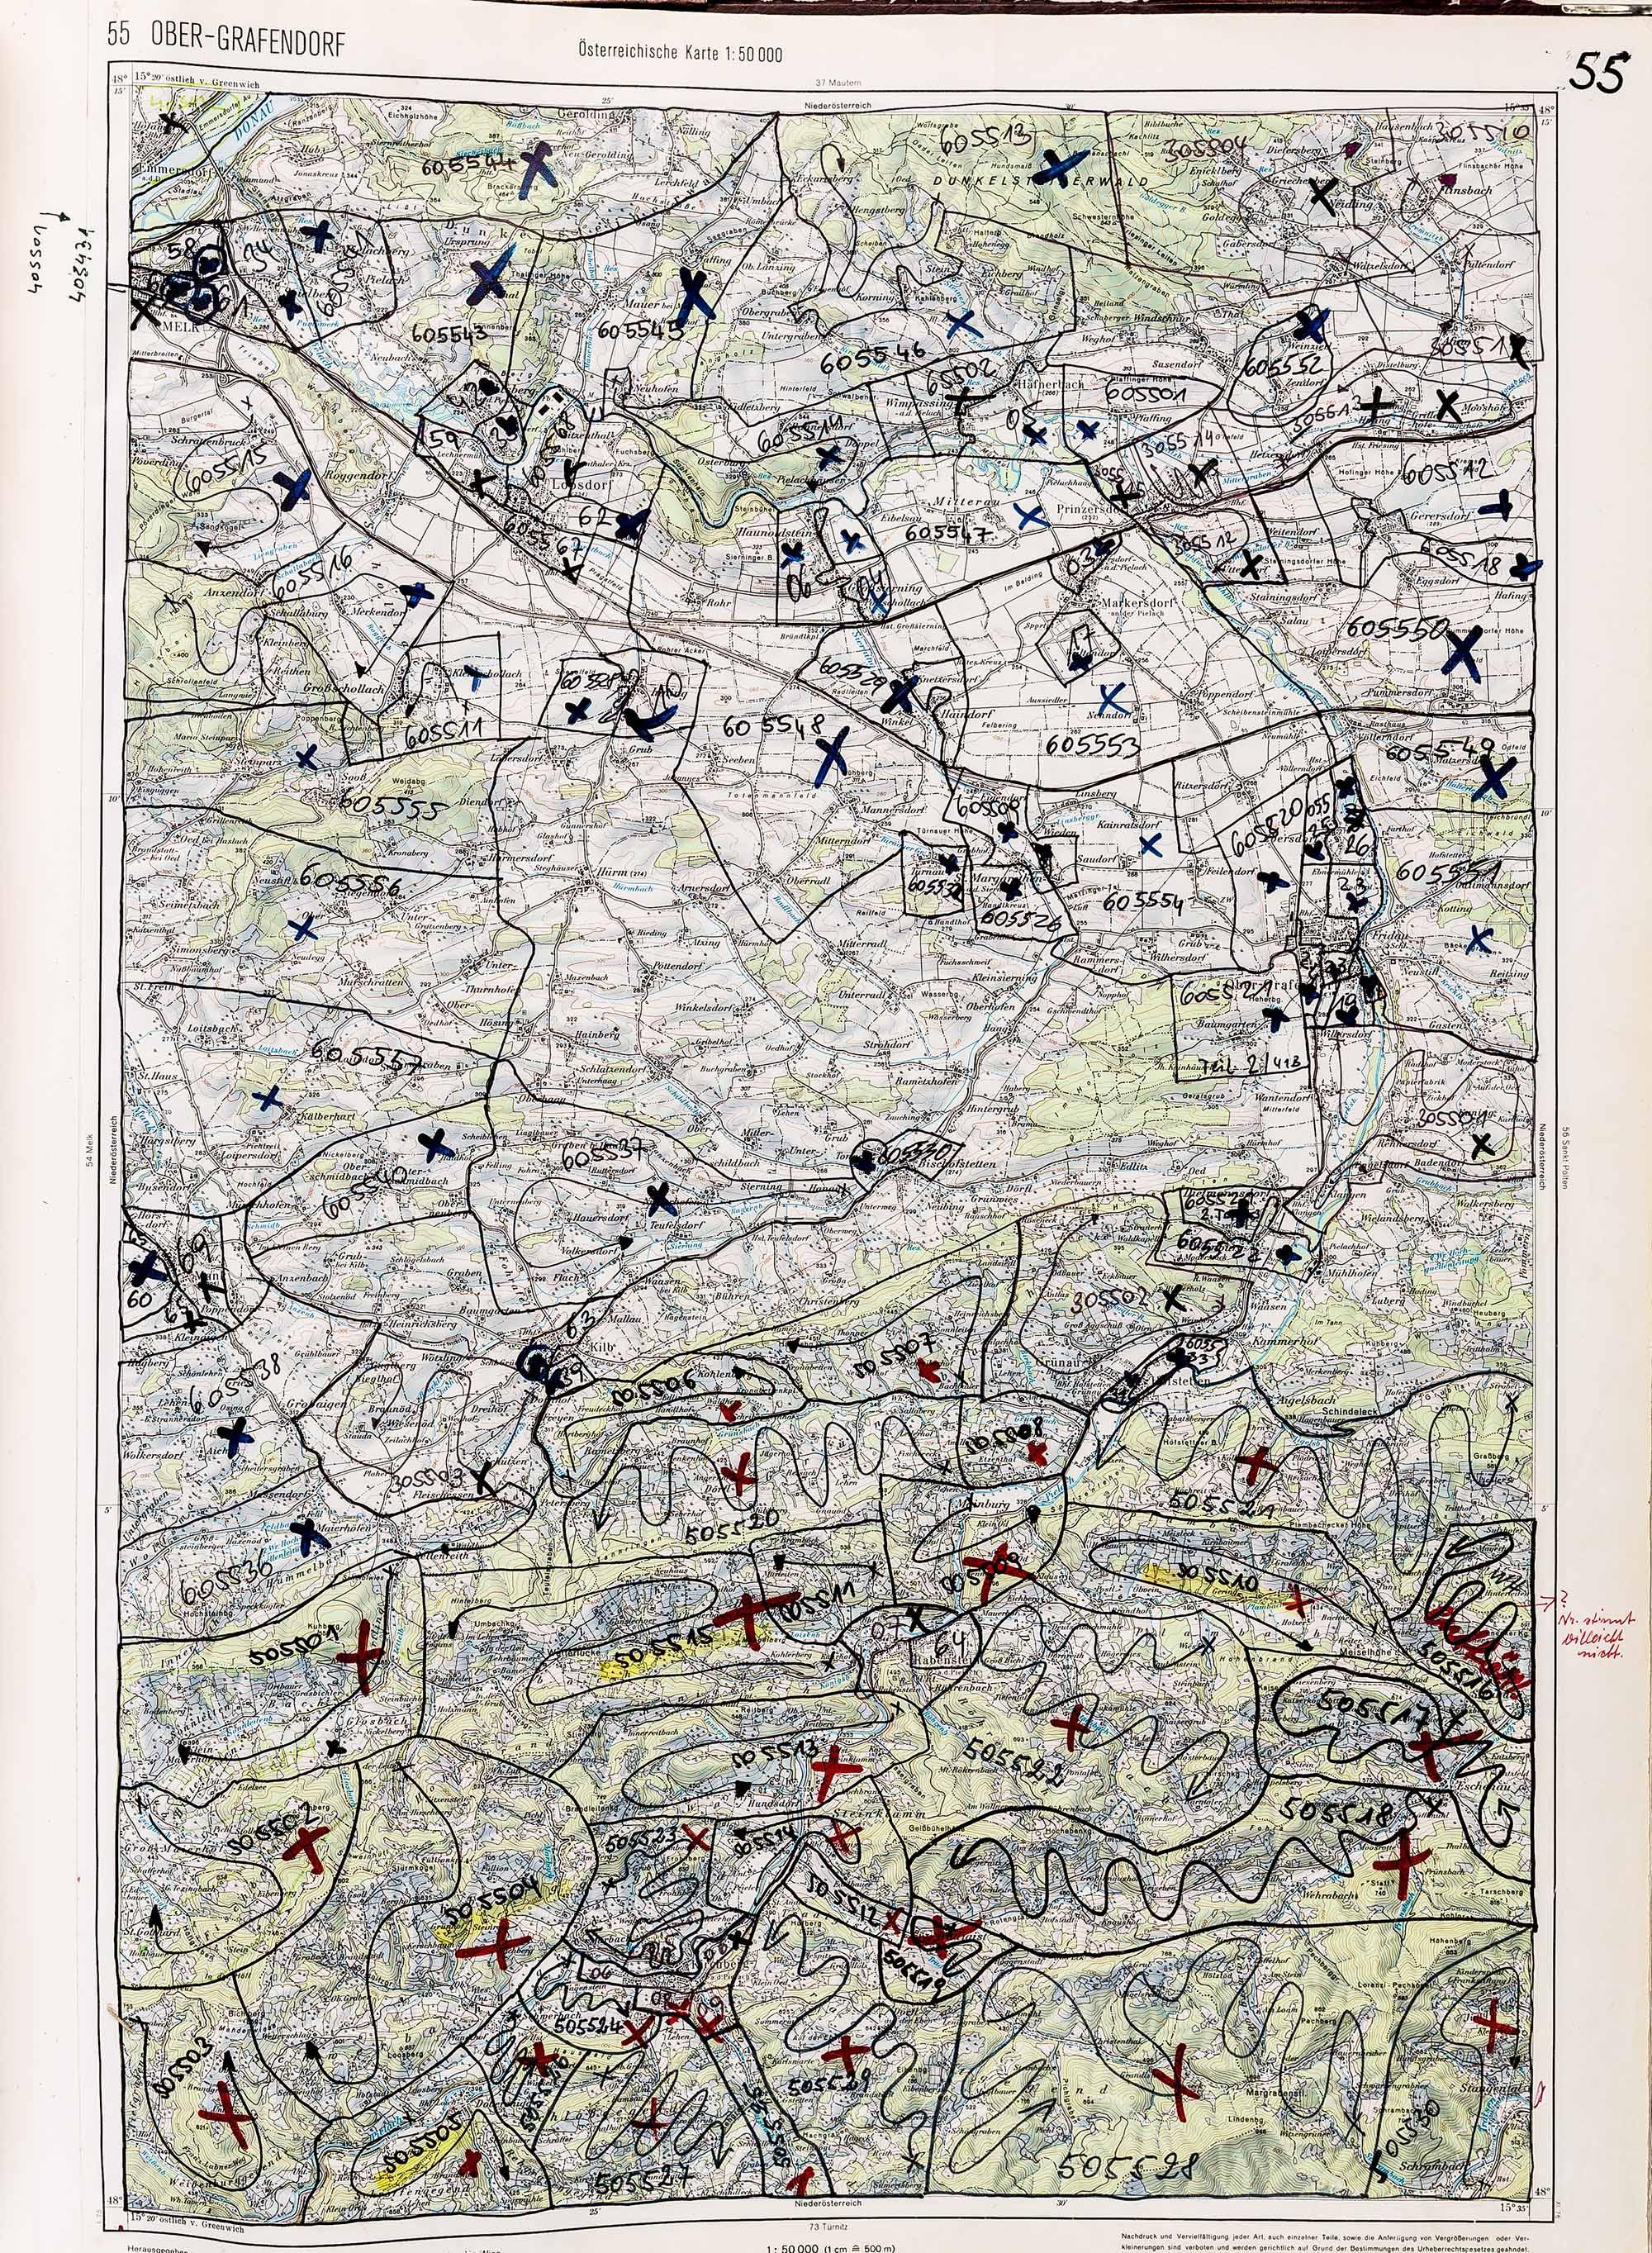 1983-1986 Karte 055